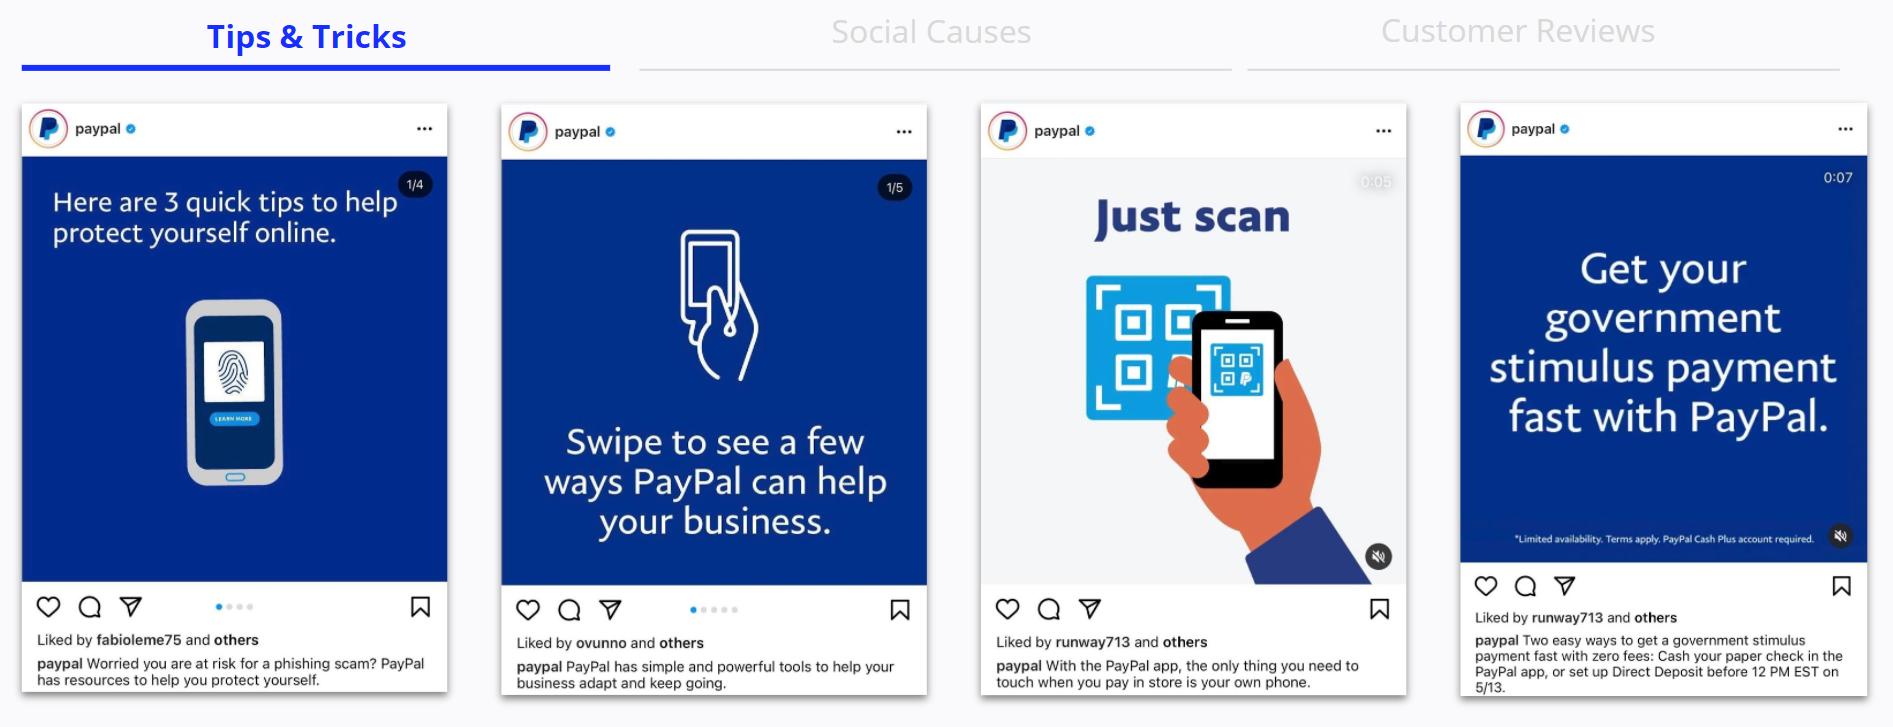 Paypal - Social Media Posts - Tips & Tricks